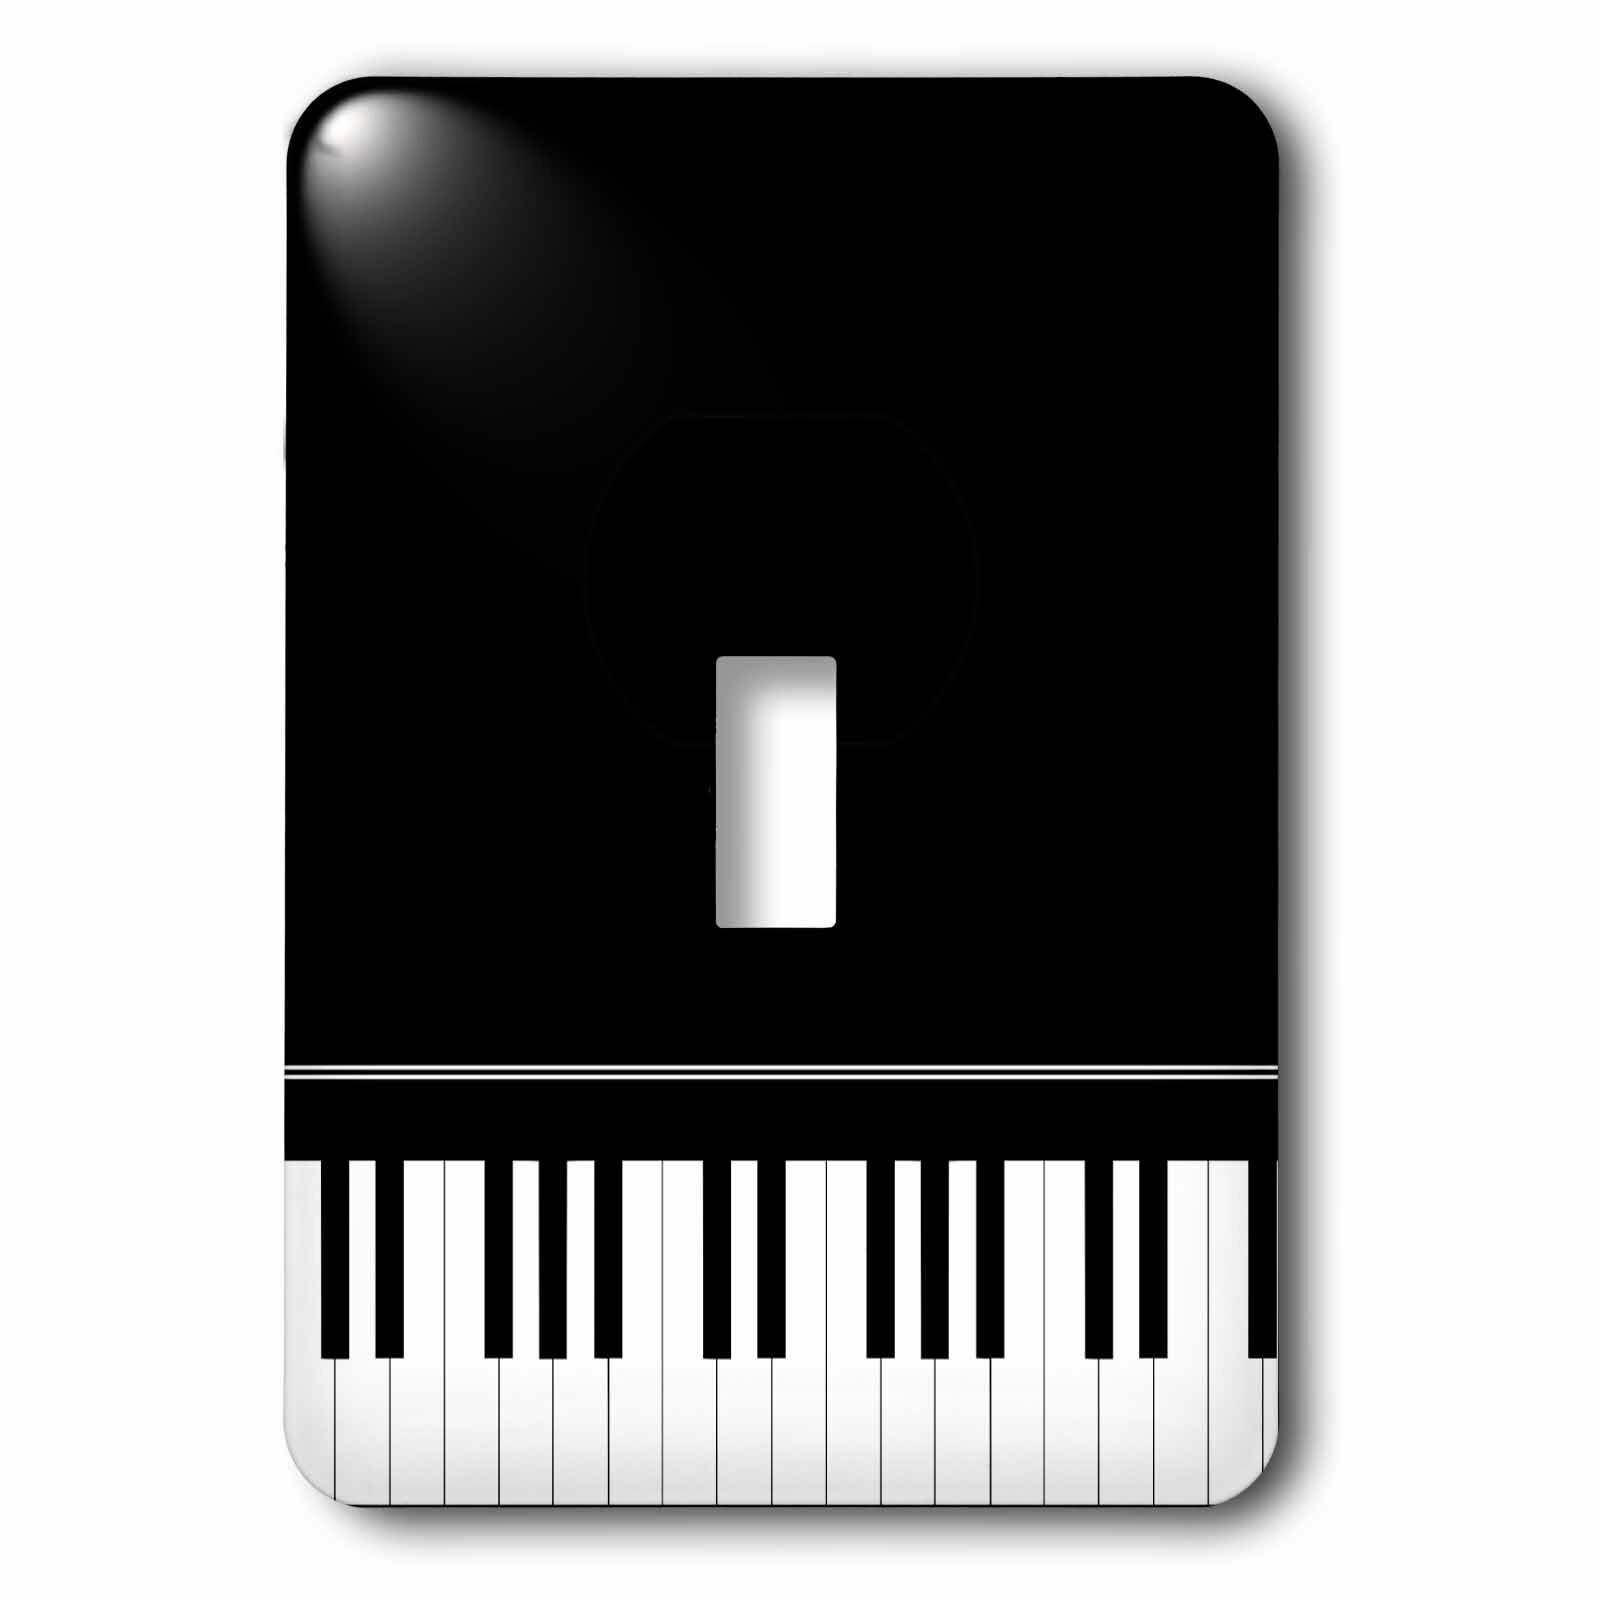 3drose Piano Keyboard Music Design 1 Gang Toggle Light Switch Wall Plate Wayfair